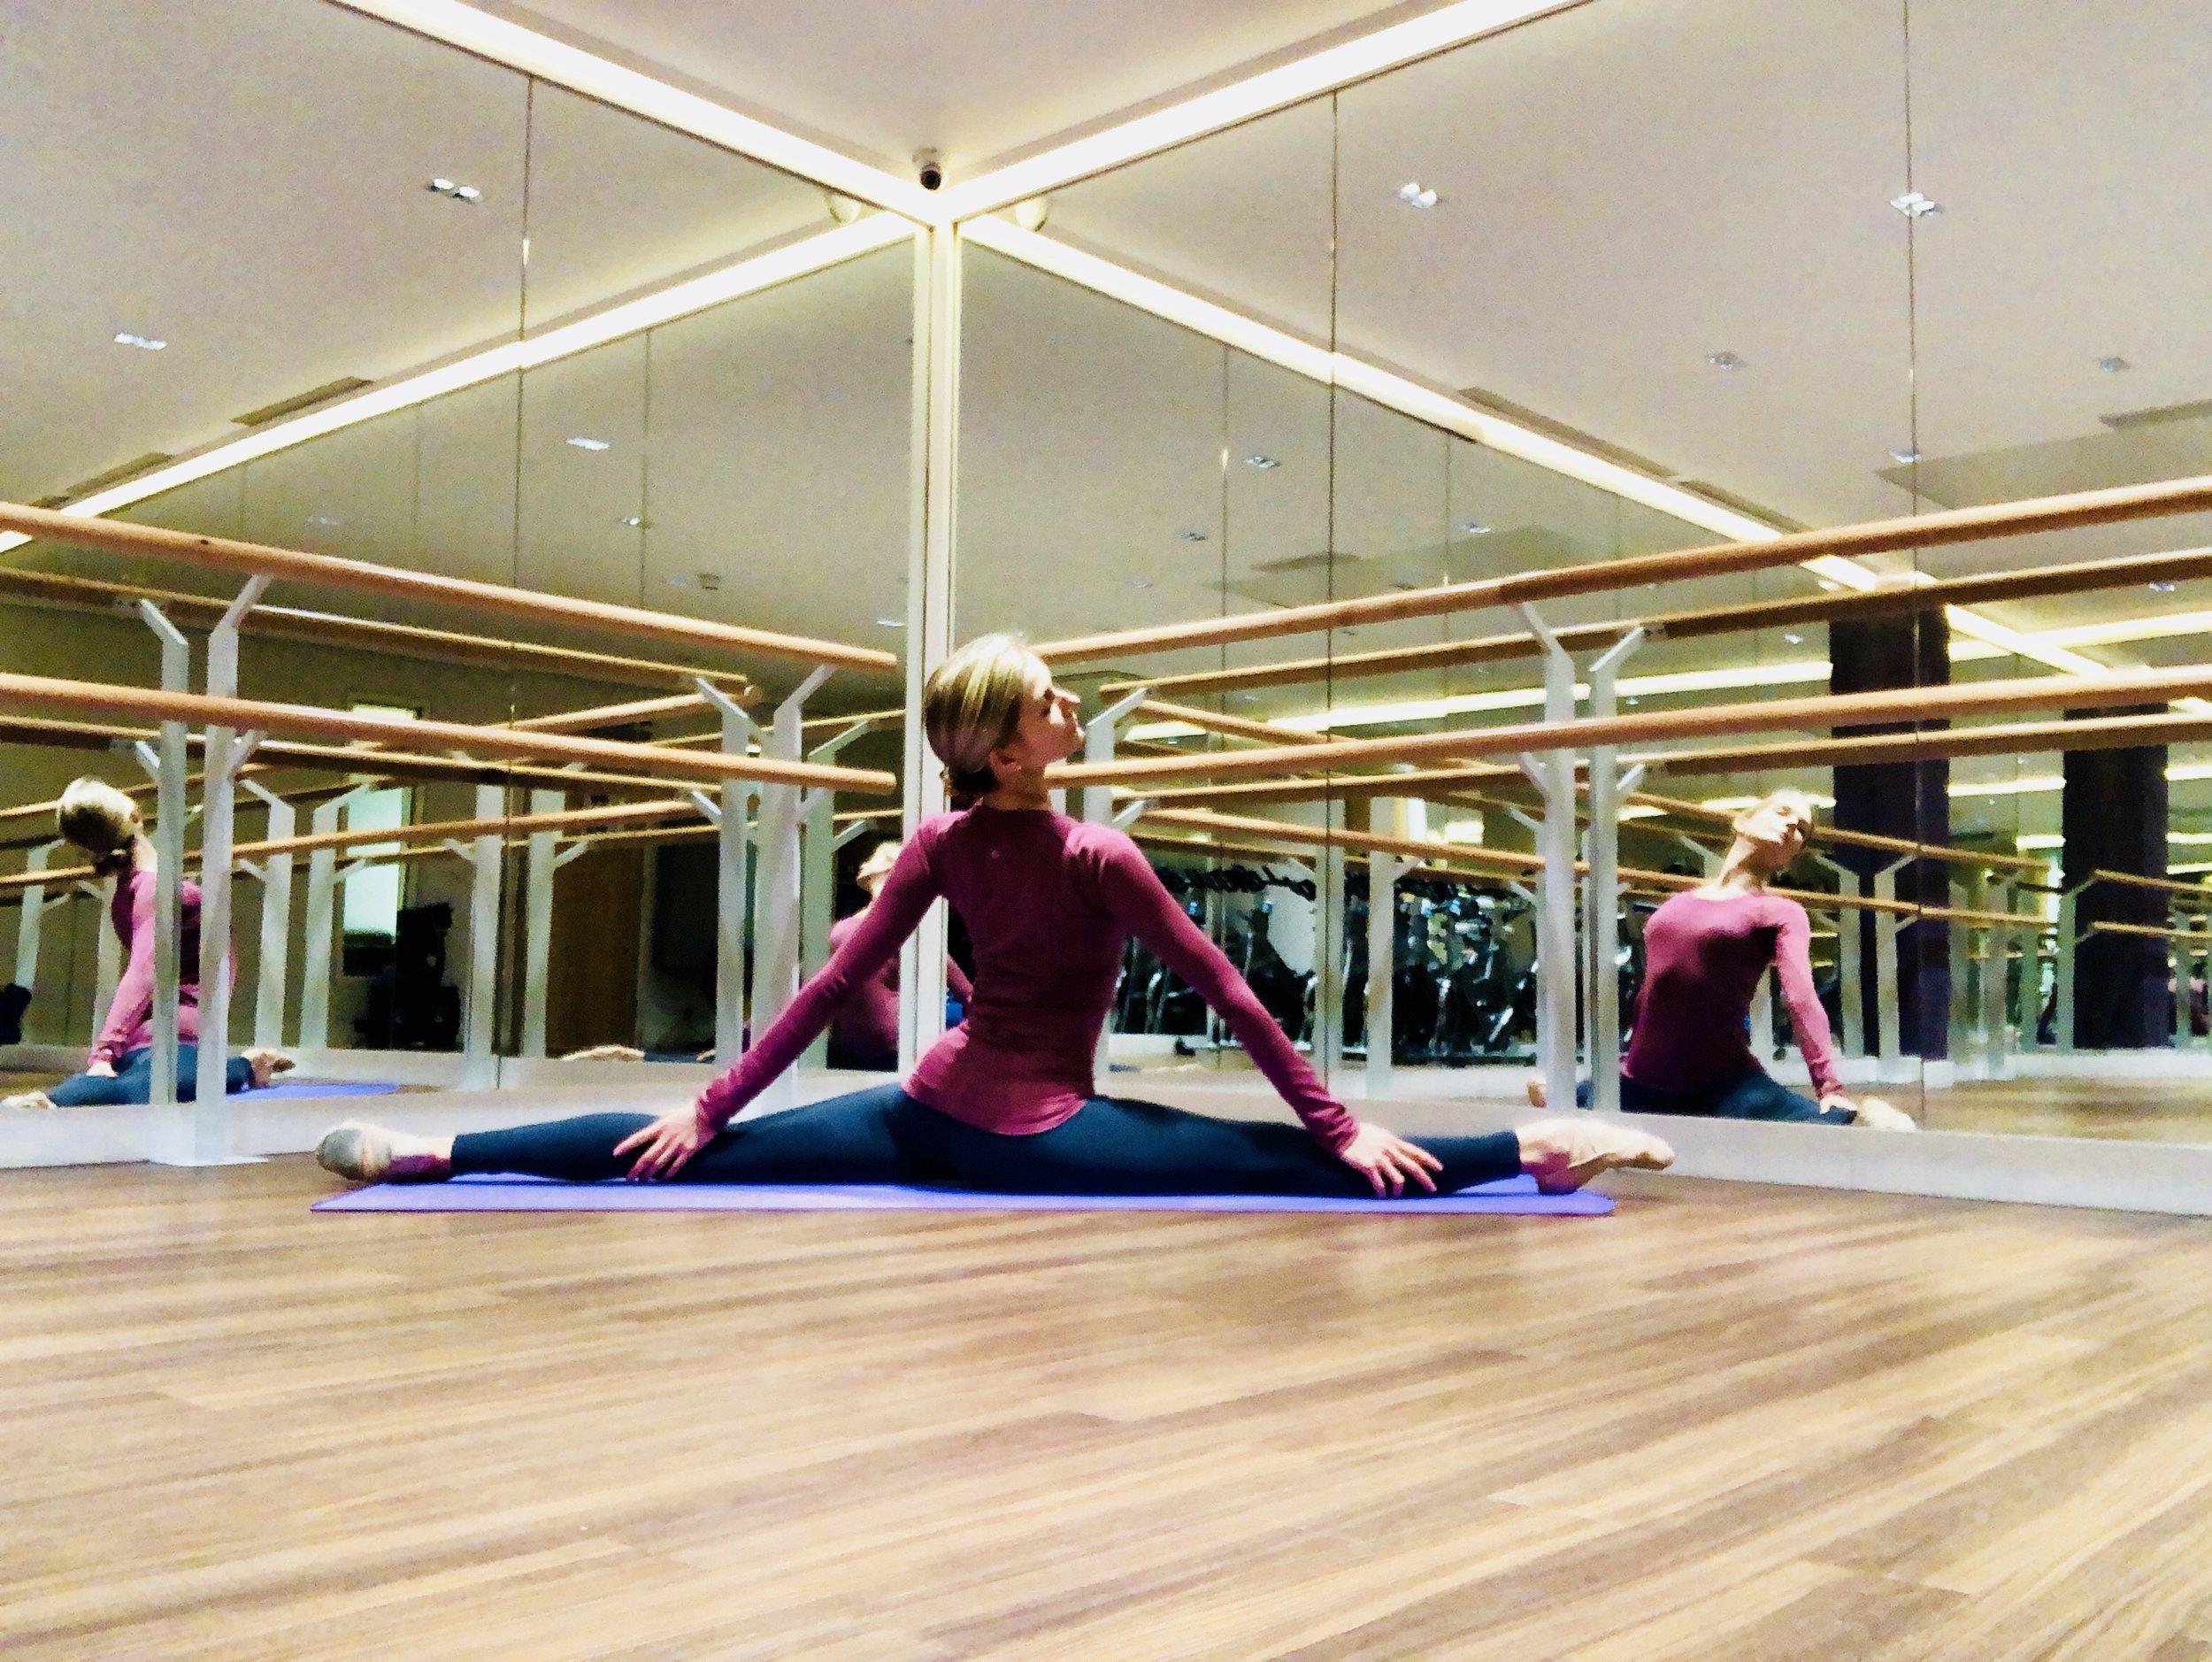 ballet-body-sculpture-classes-flexibility-training